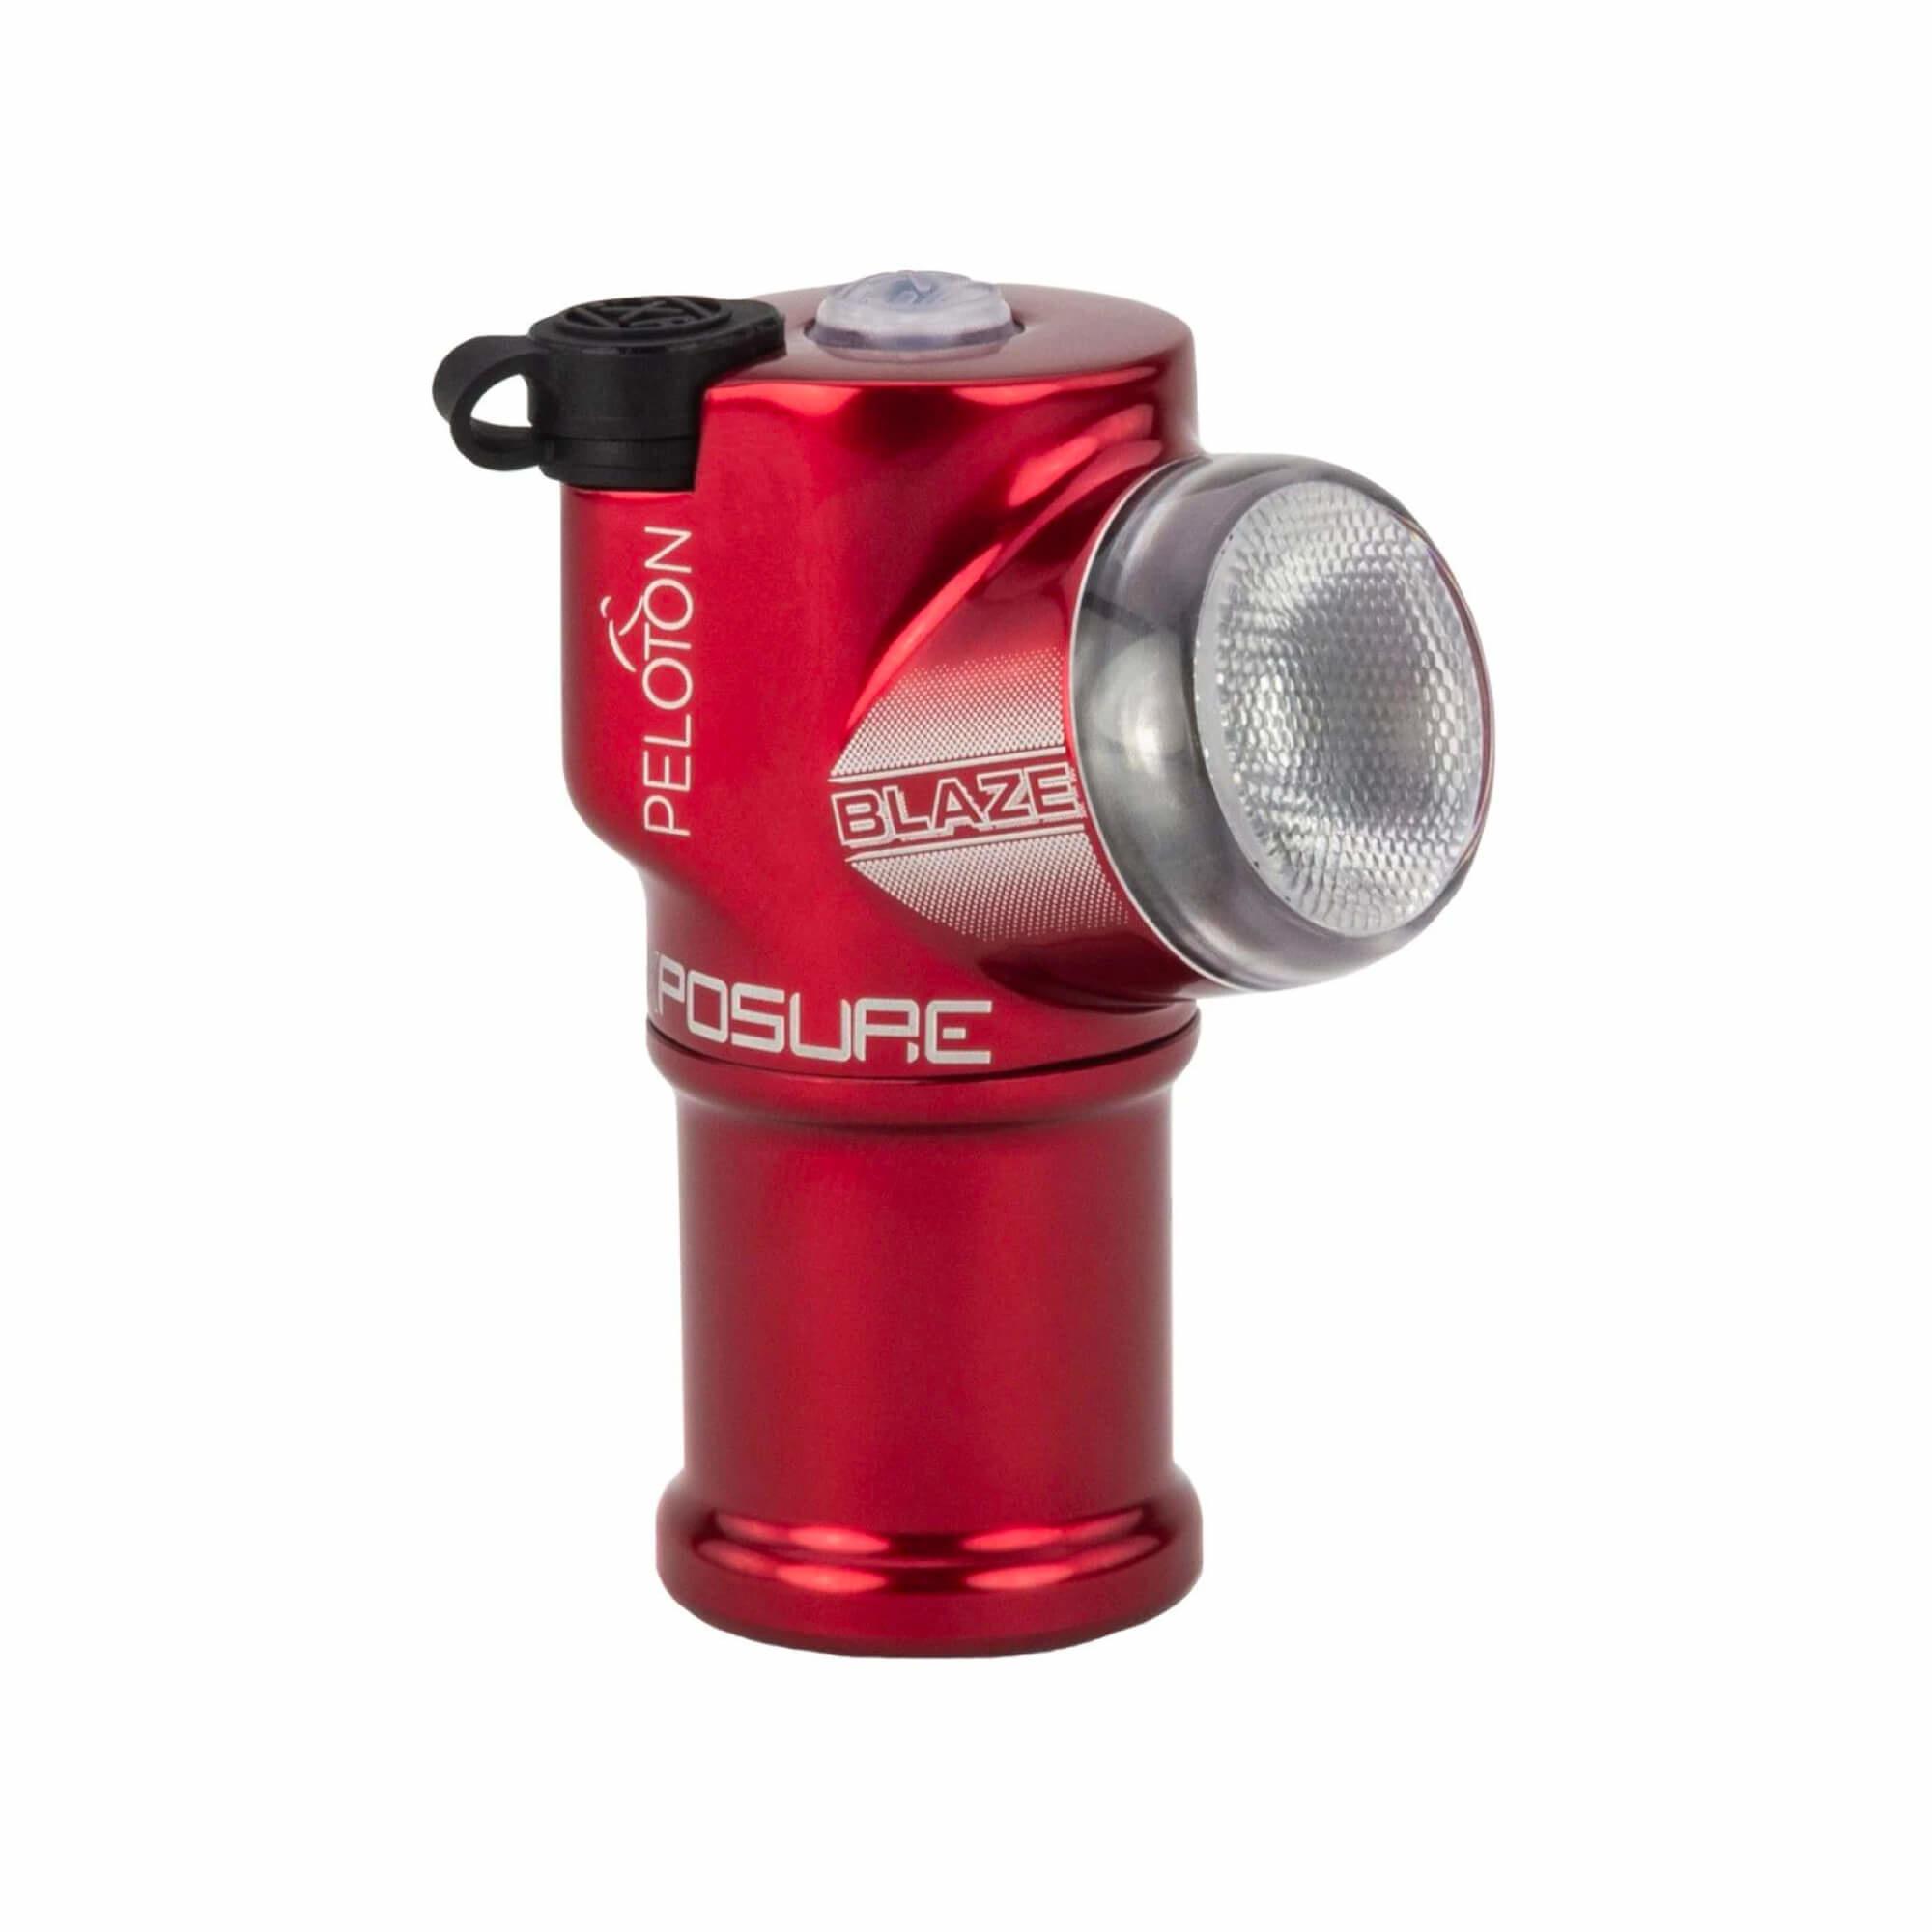 Blaze MK3 150-80 Lumen With Daybright, Reakt & Peleton Mode-1